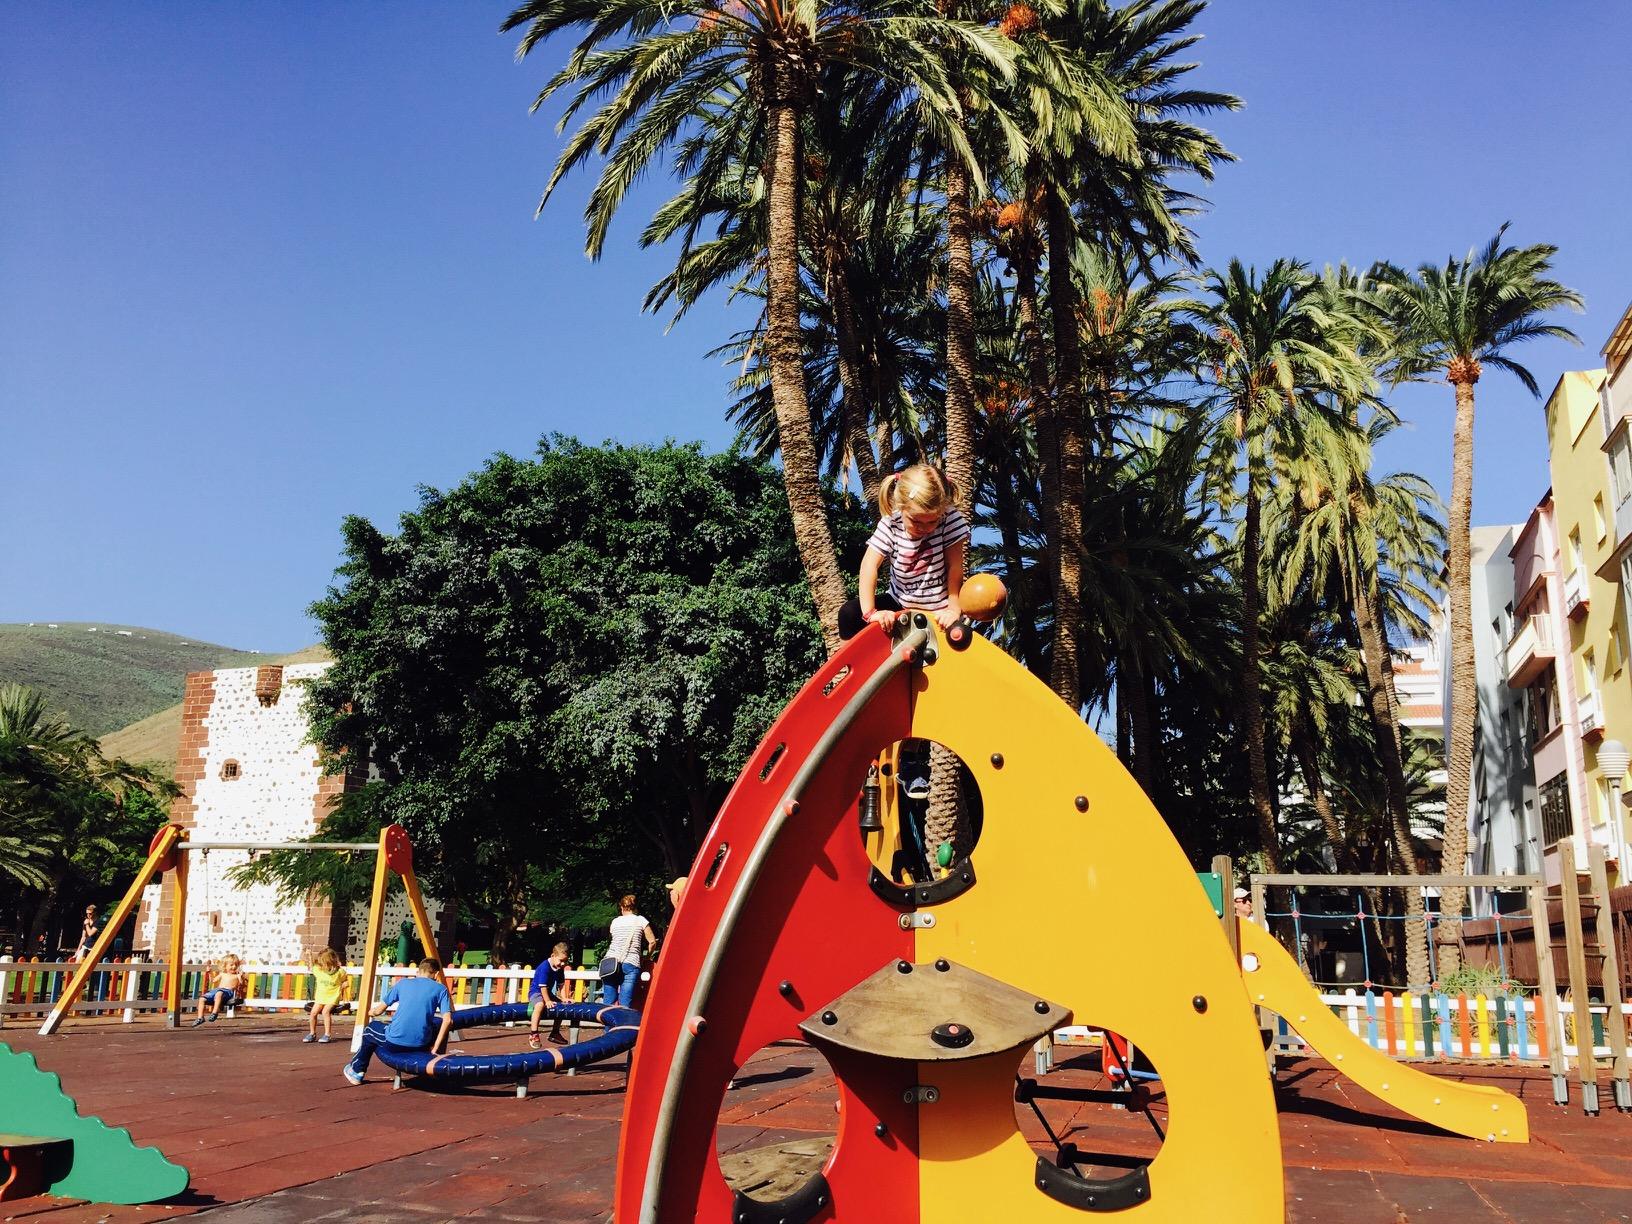 Spielplatz im Park in San Sebastian, La Gomera